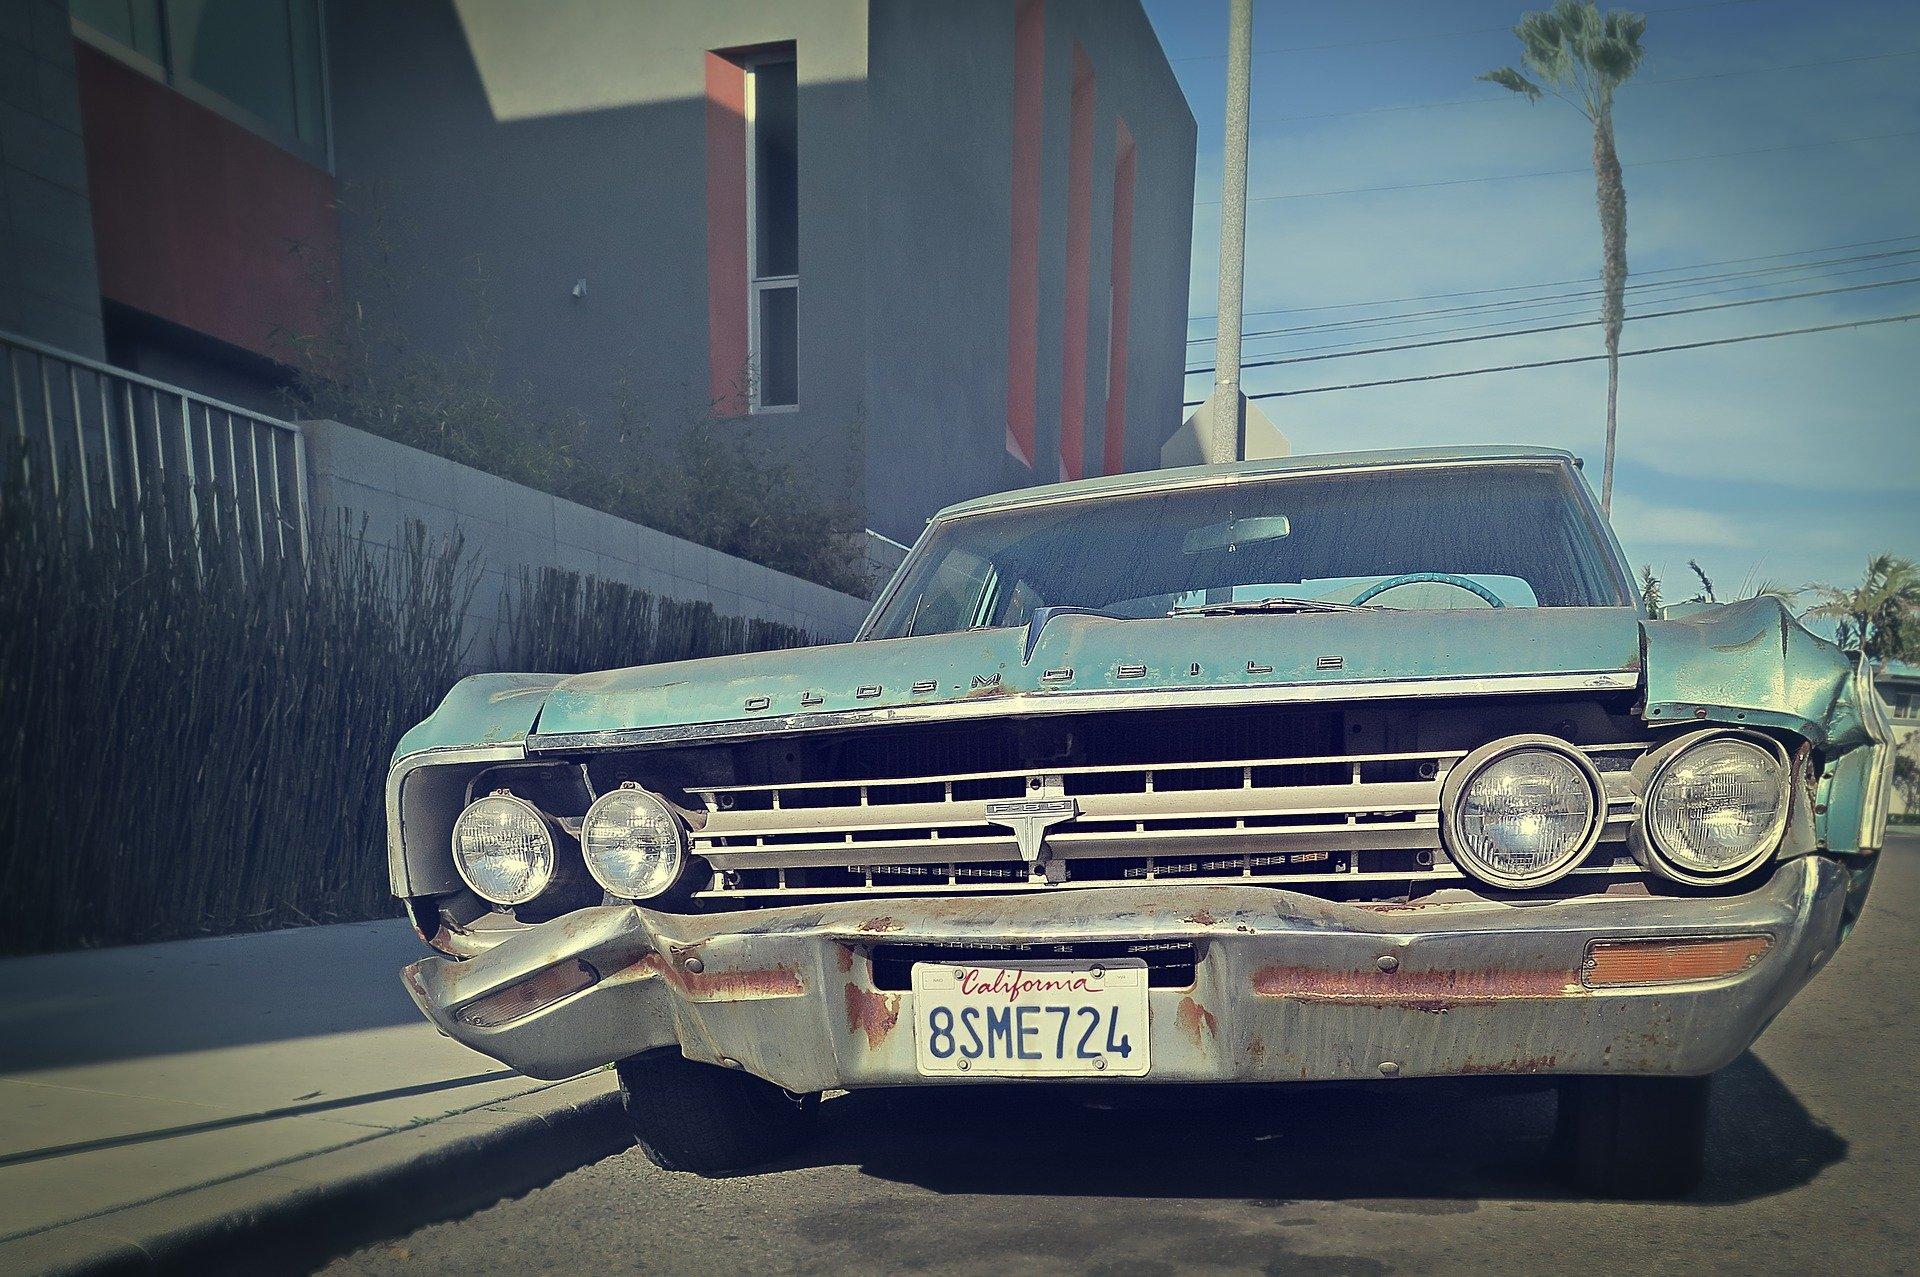 Old Classic Car in La Mesa California - VeteranCarDonations.org